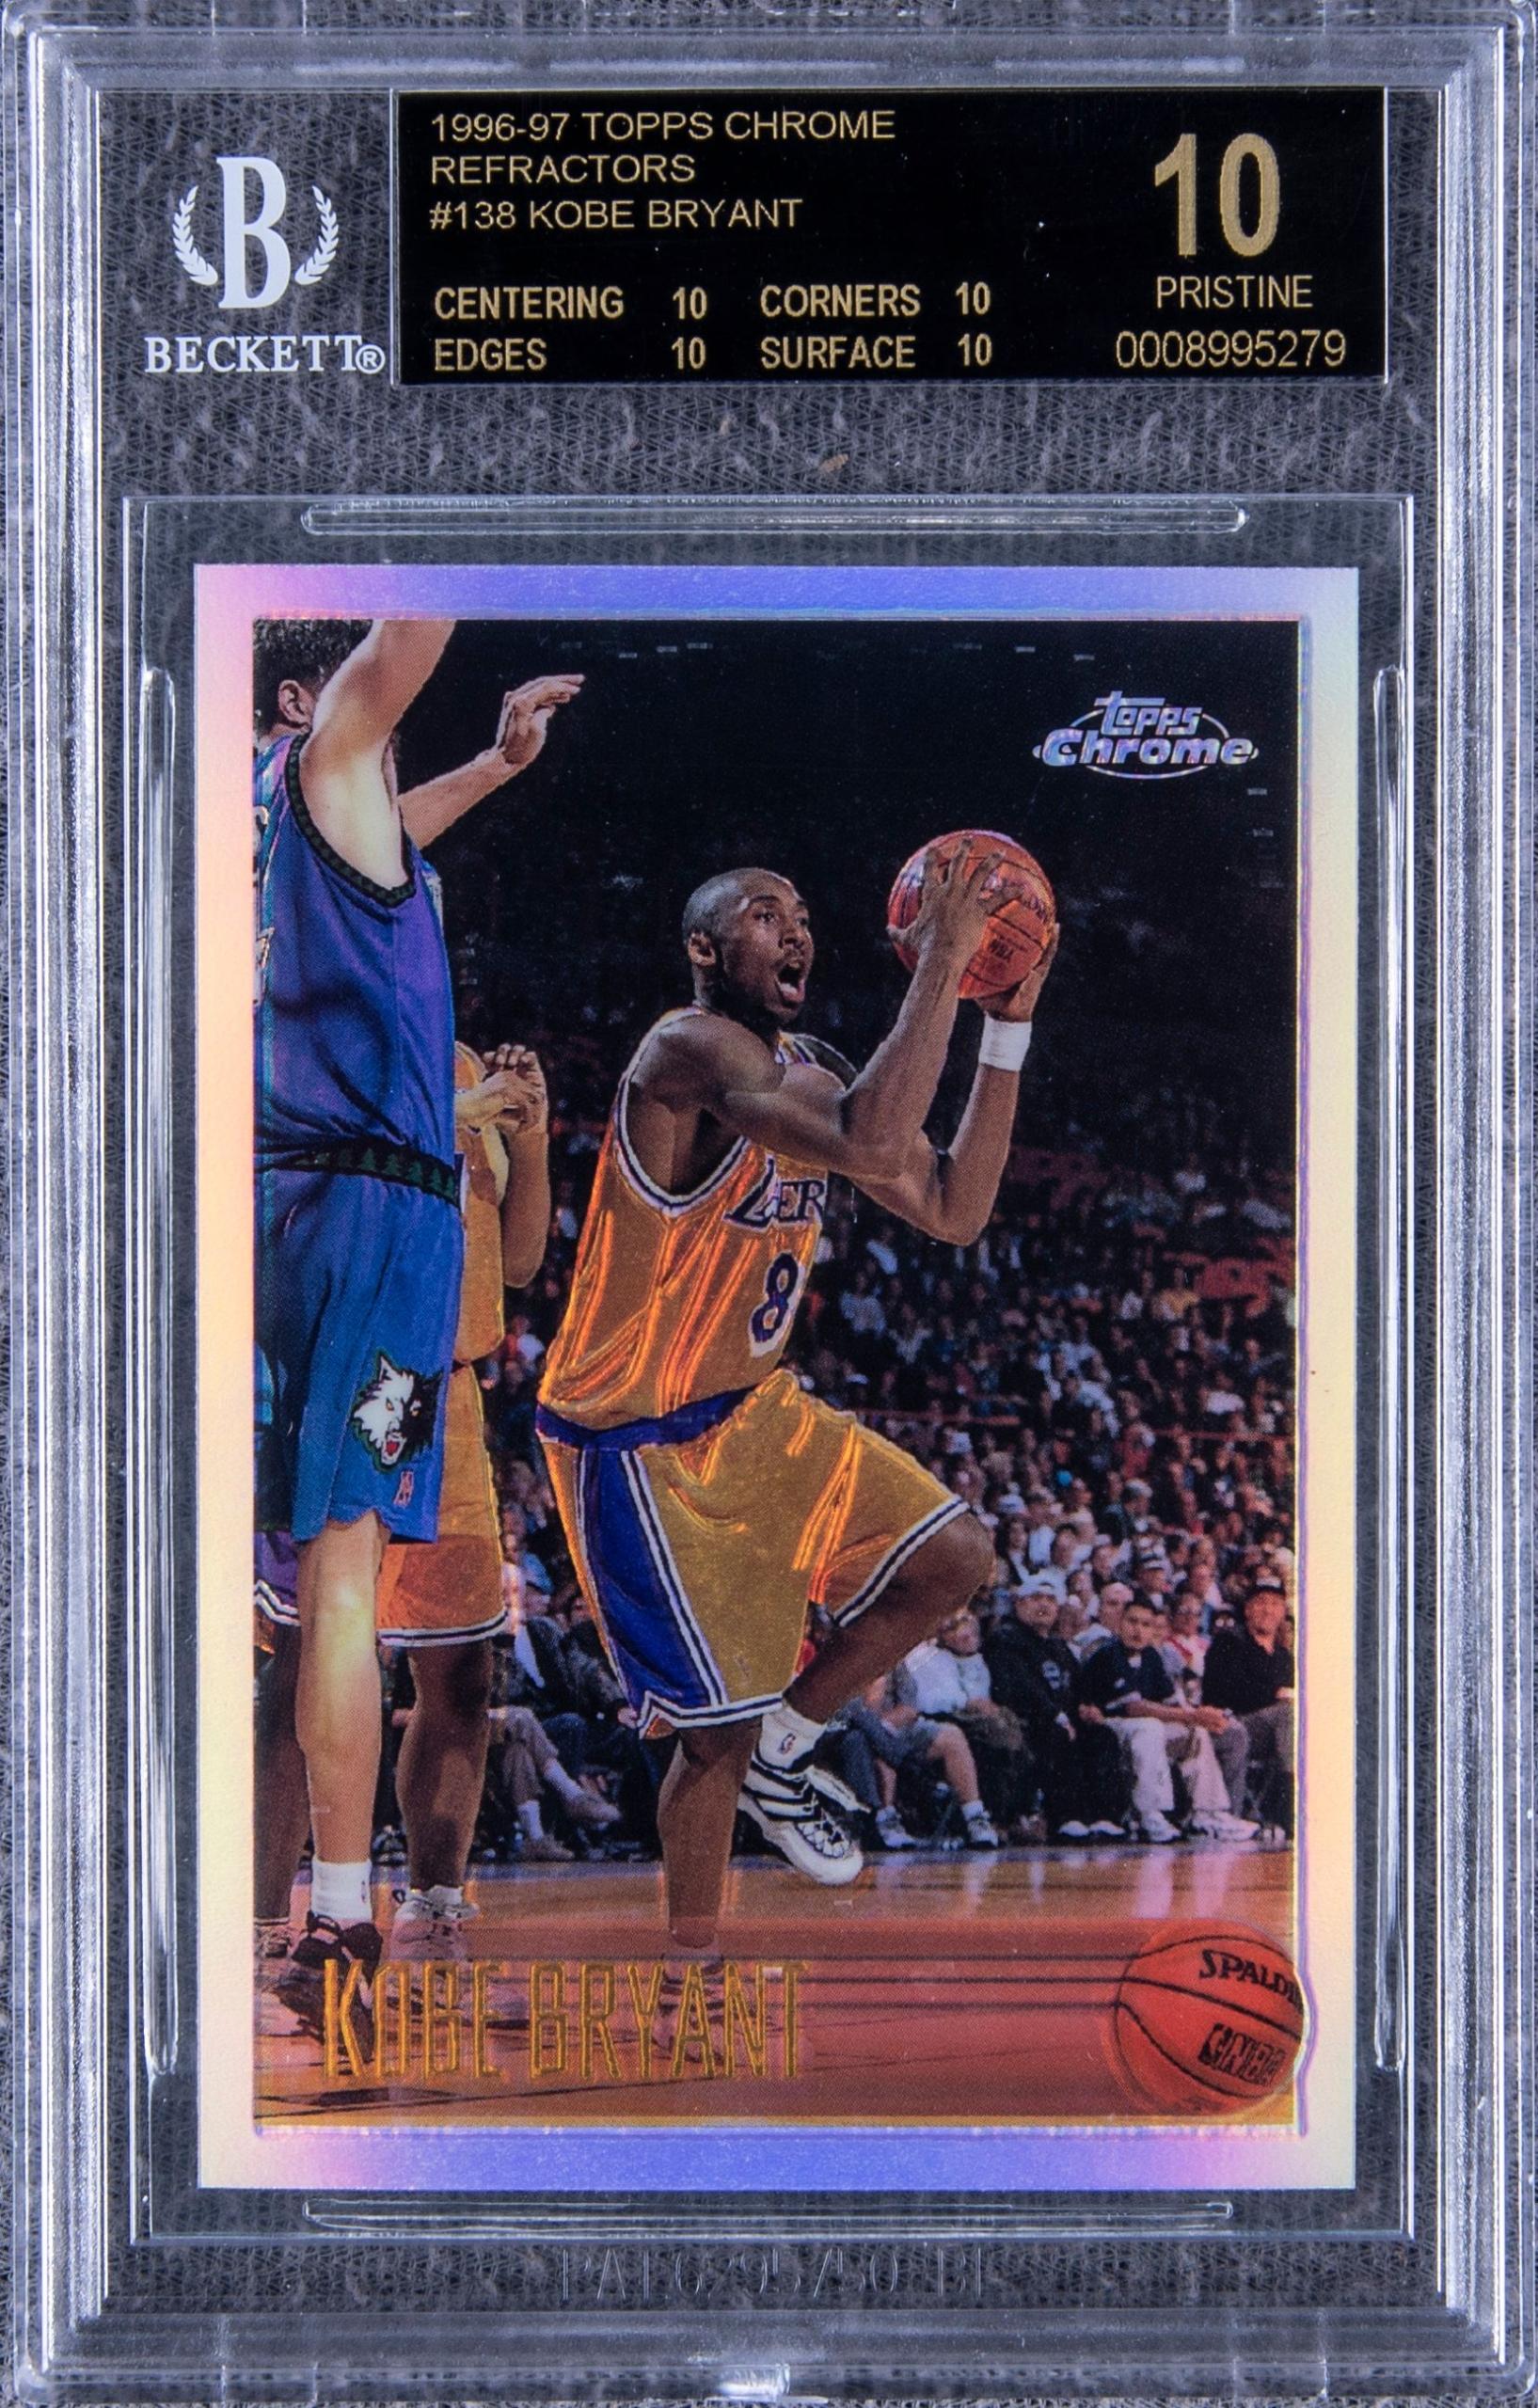 Kobe Bryant Topps rookie card, $1.796 million, Goldin Auctions